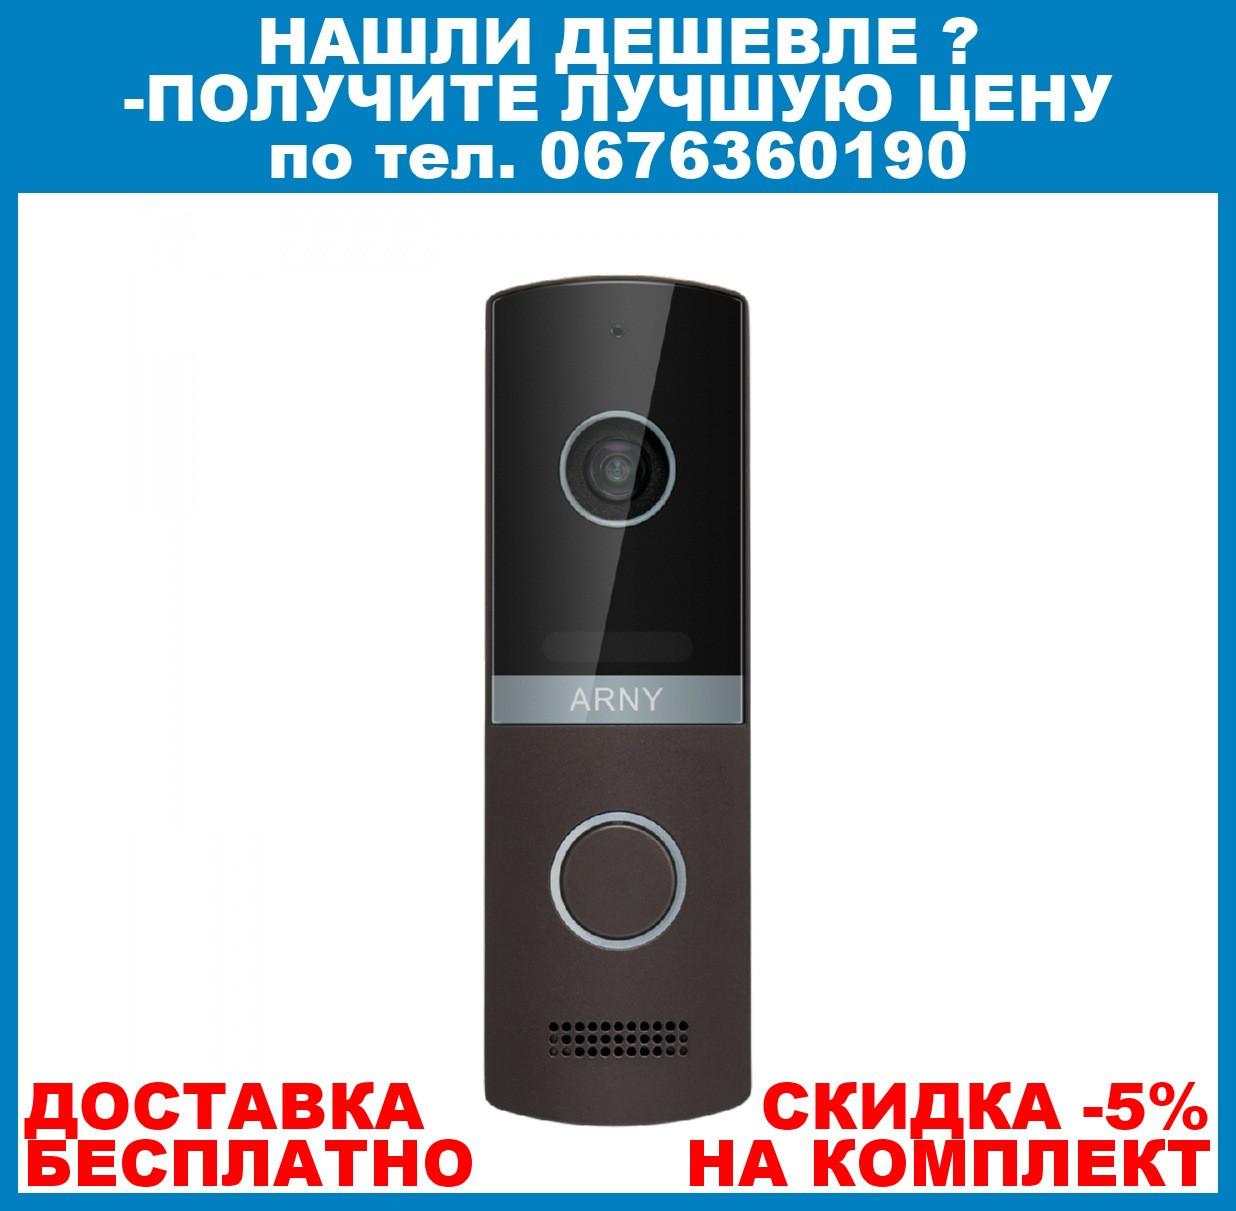 Видеопанель ARNY AVP-NG230 1MPX